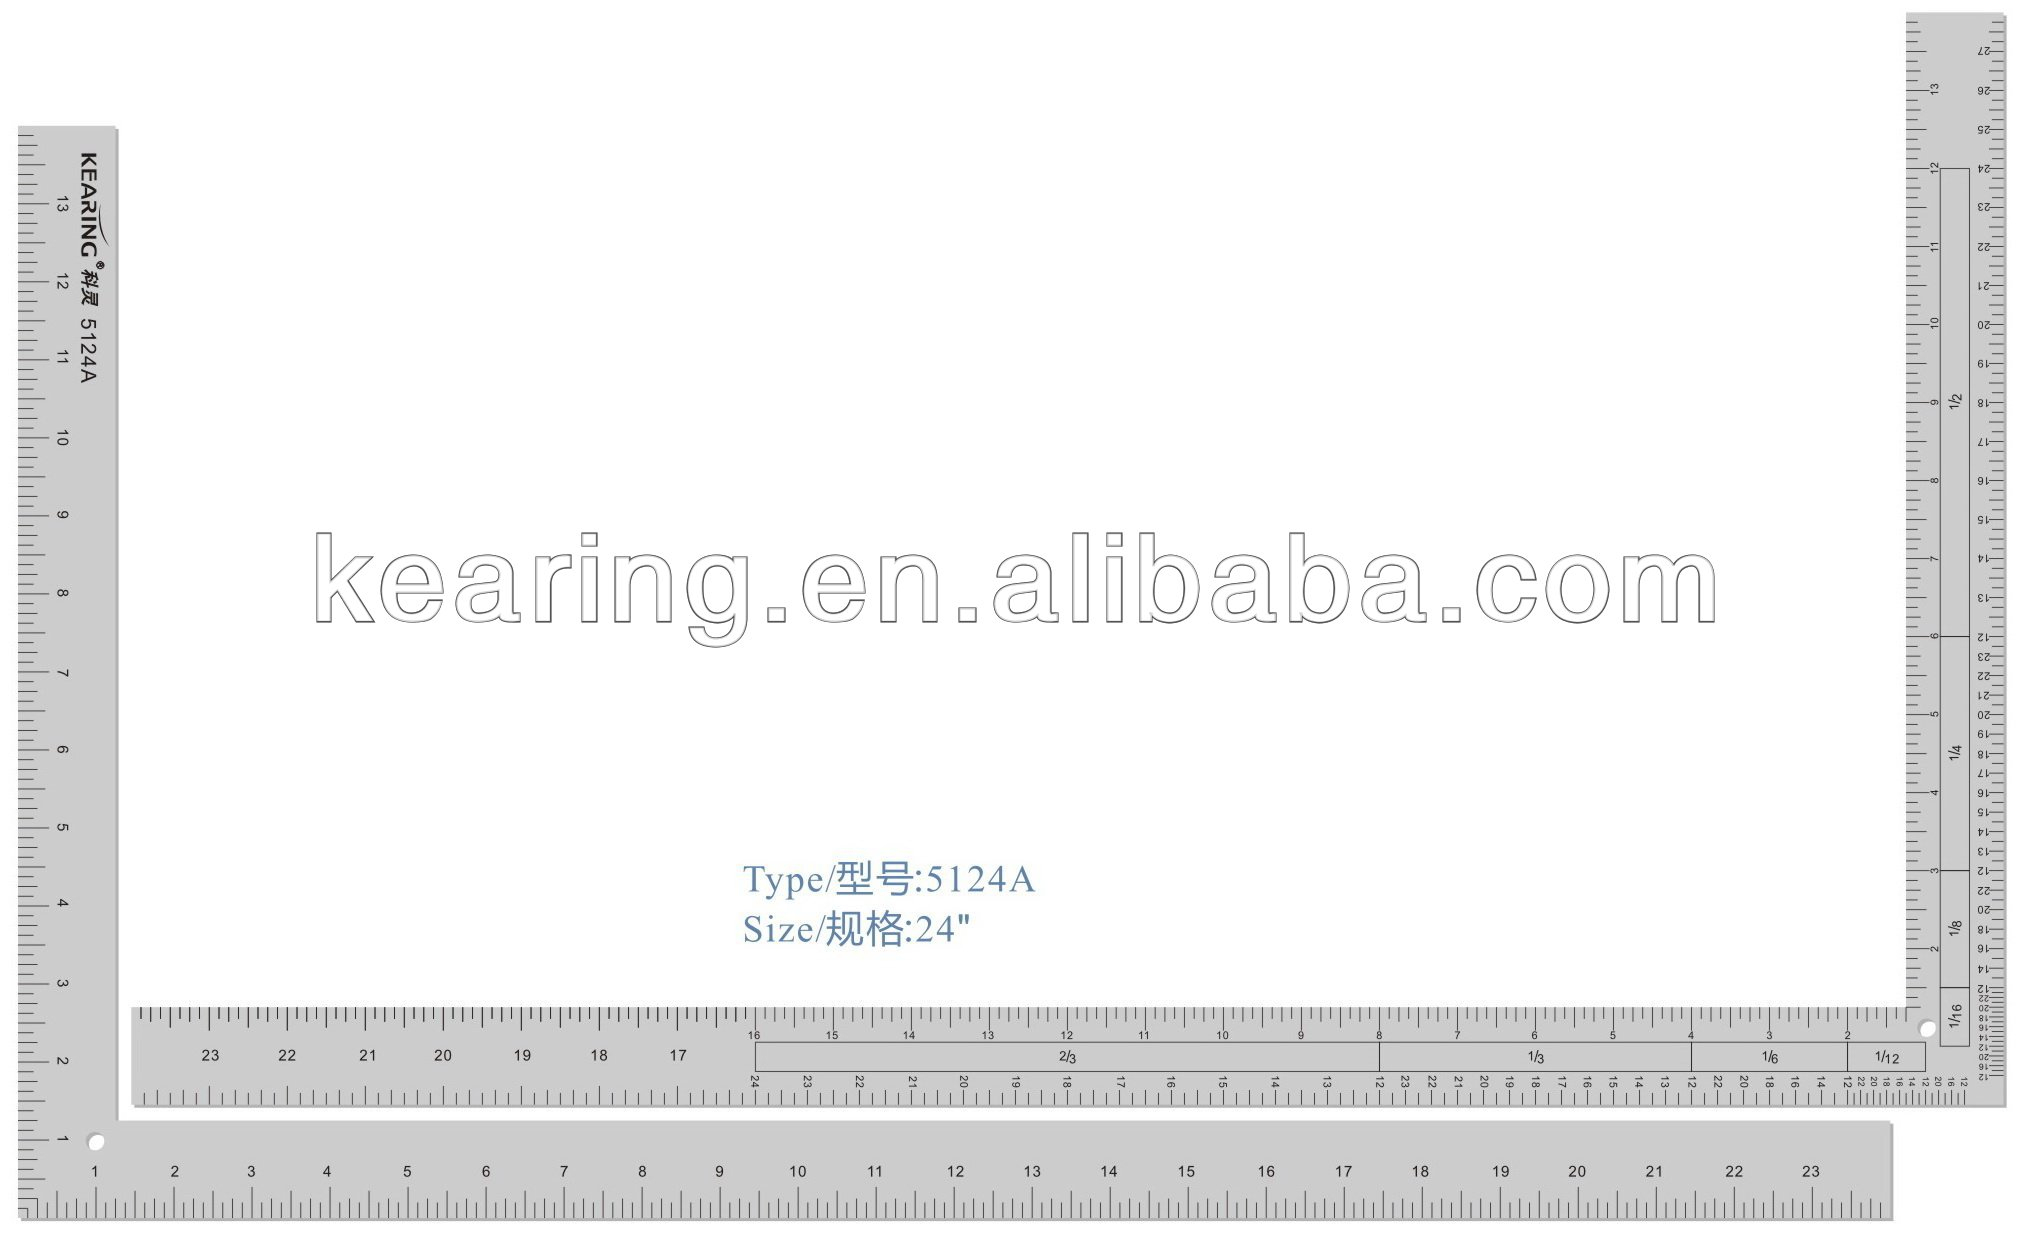 Kearing Brand,12''&24'' Length Right Angle Garment Ruler,for Fashion Design  #5124A - Buy Right Angle Garment Ruler,pattern Making Rulers,l Shape